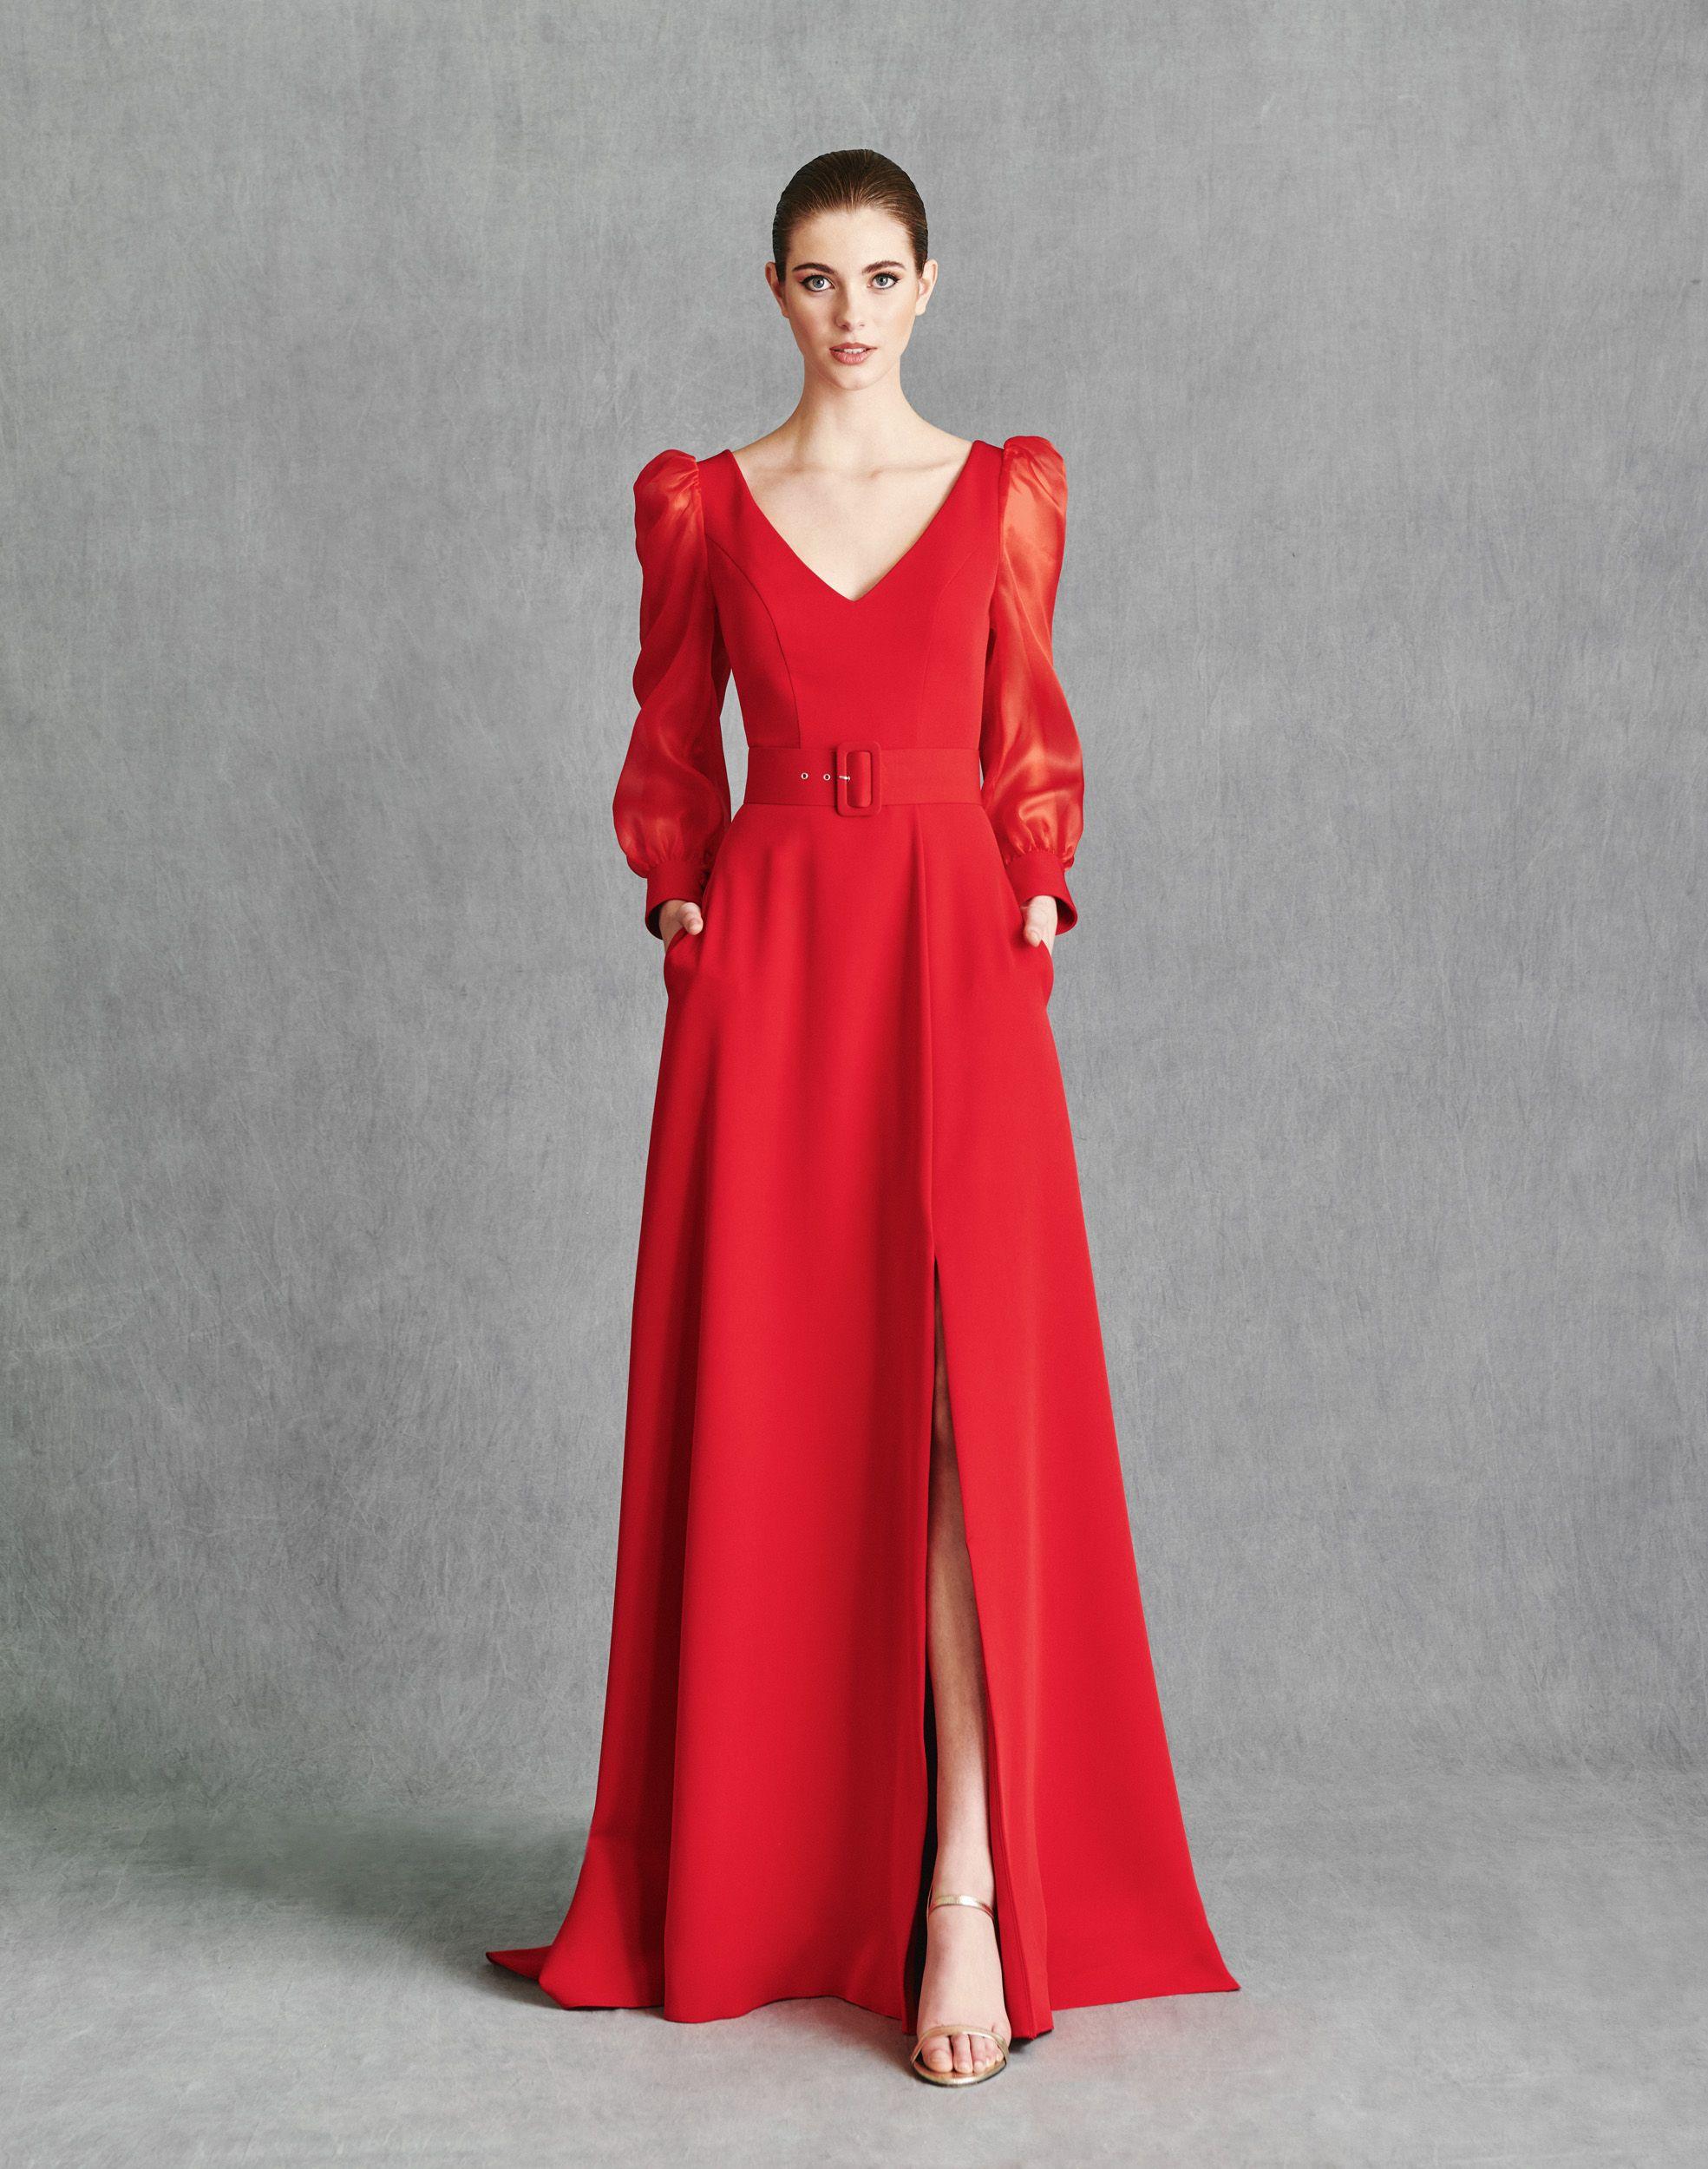 Vestidos de Fiesta 2020 - Silvia Fernandez Atelier - IRATI